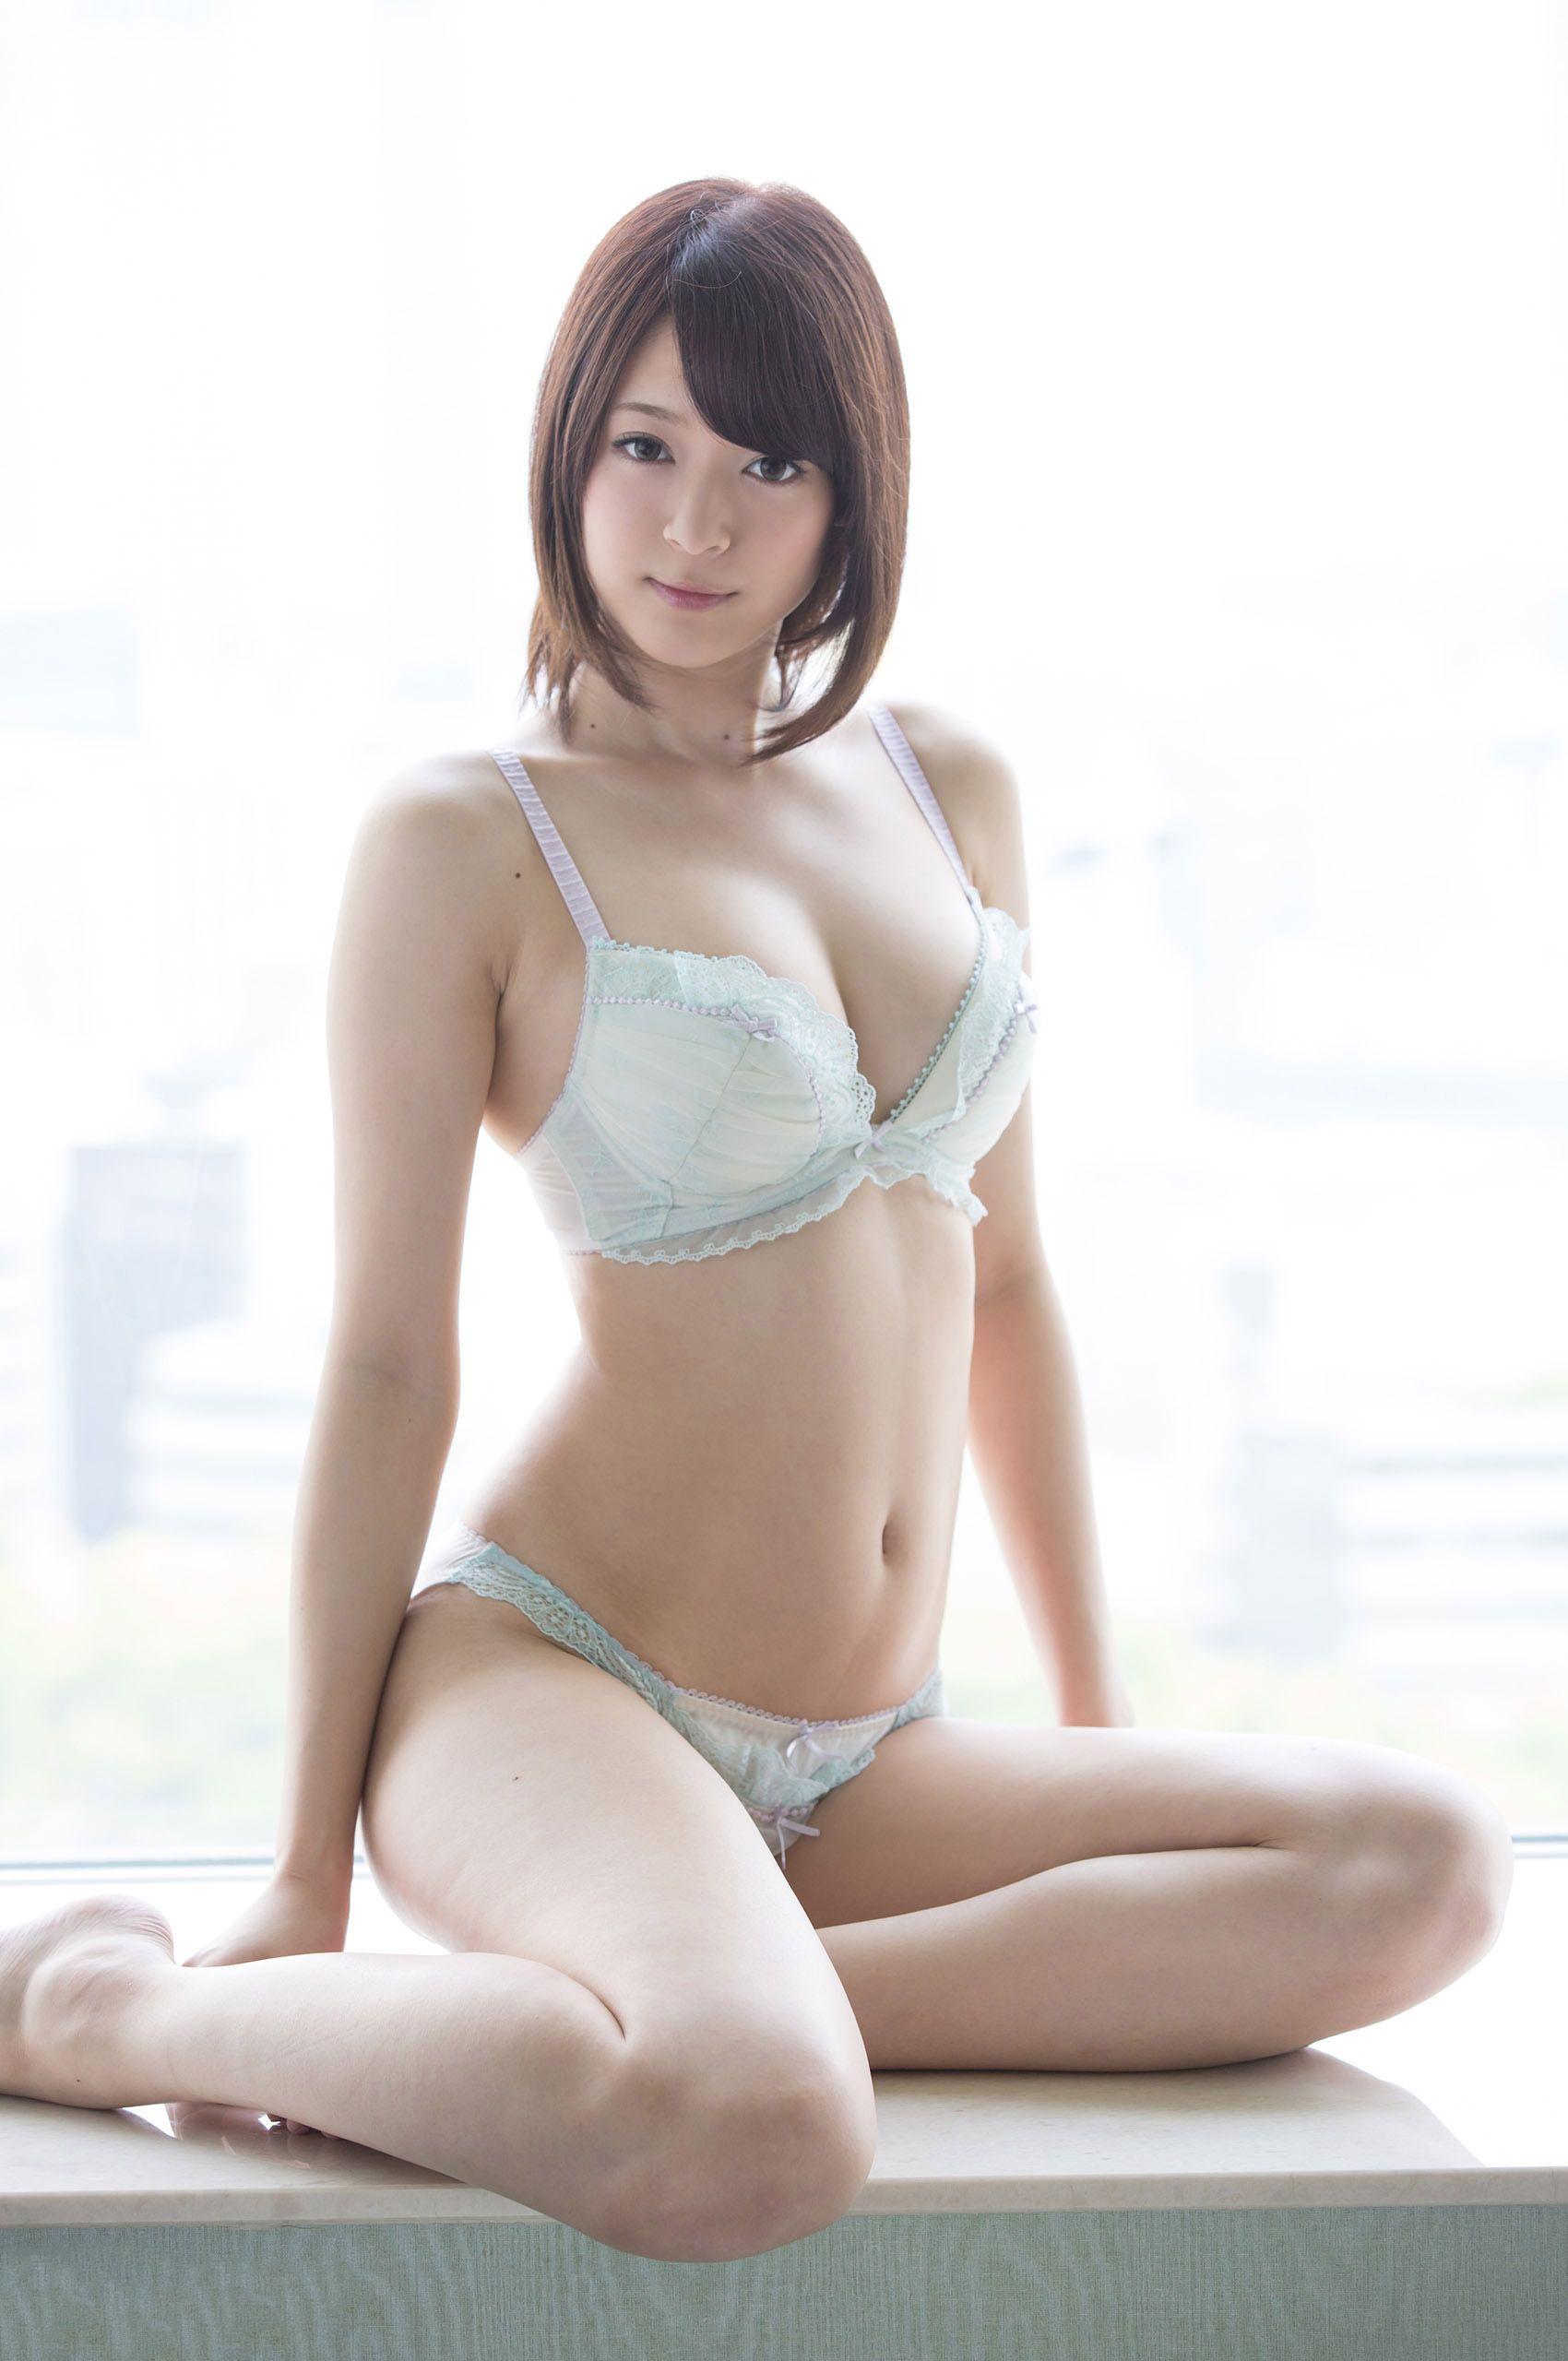 Hot Jestina Lam nude (61 foto and video), Ass, Paparazzi, Instagram, underwear 2018